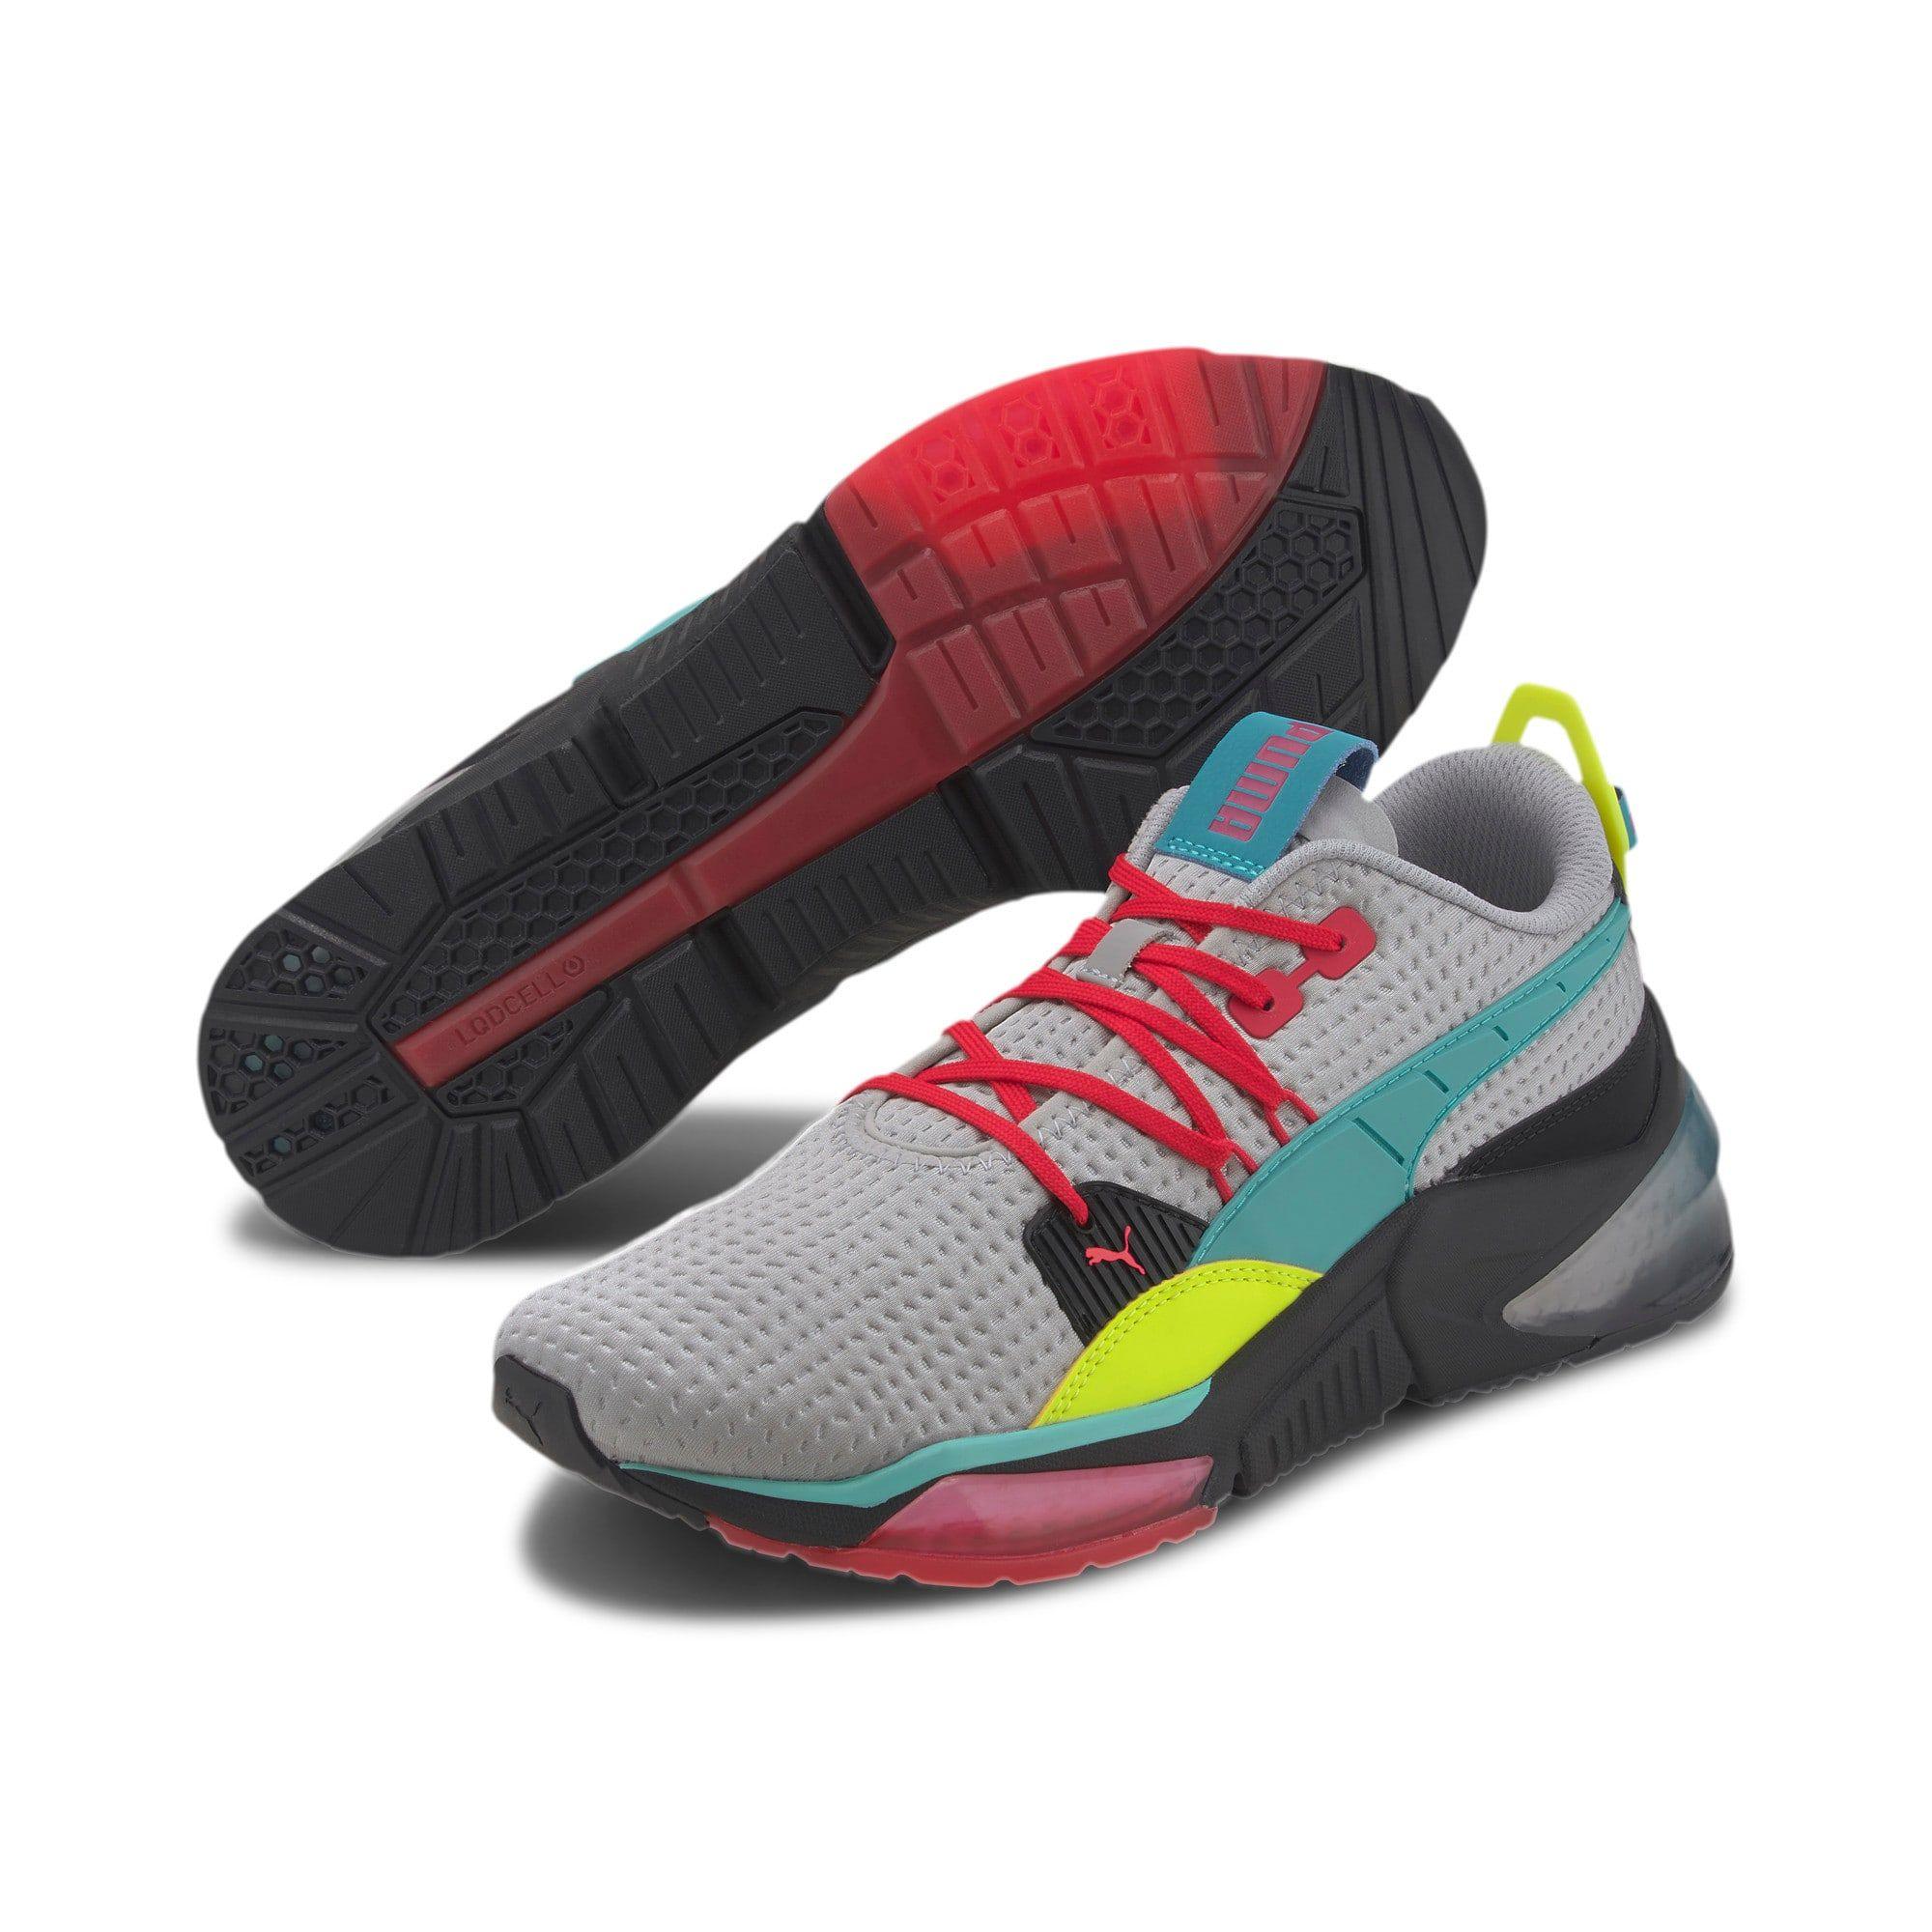 LQDCELL Optic Flight Suit Men's Running Shoes | Running ...